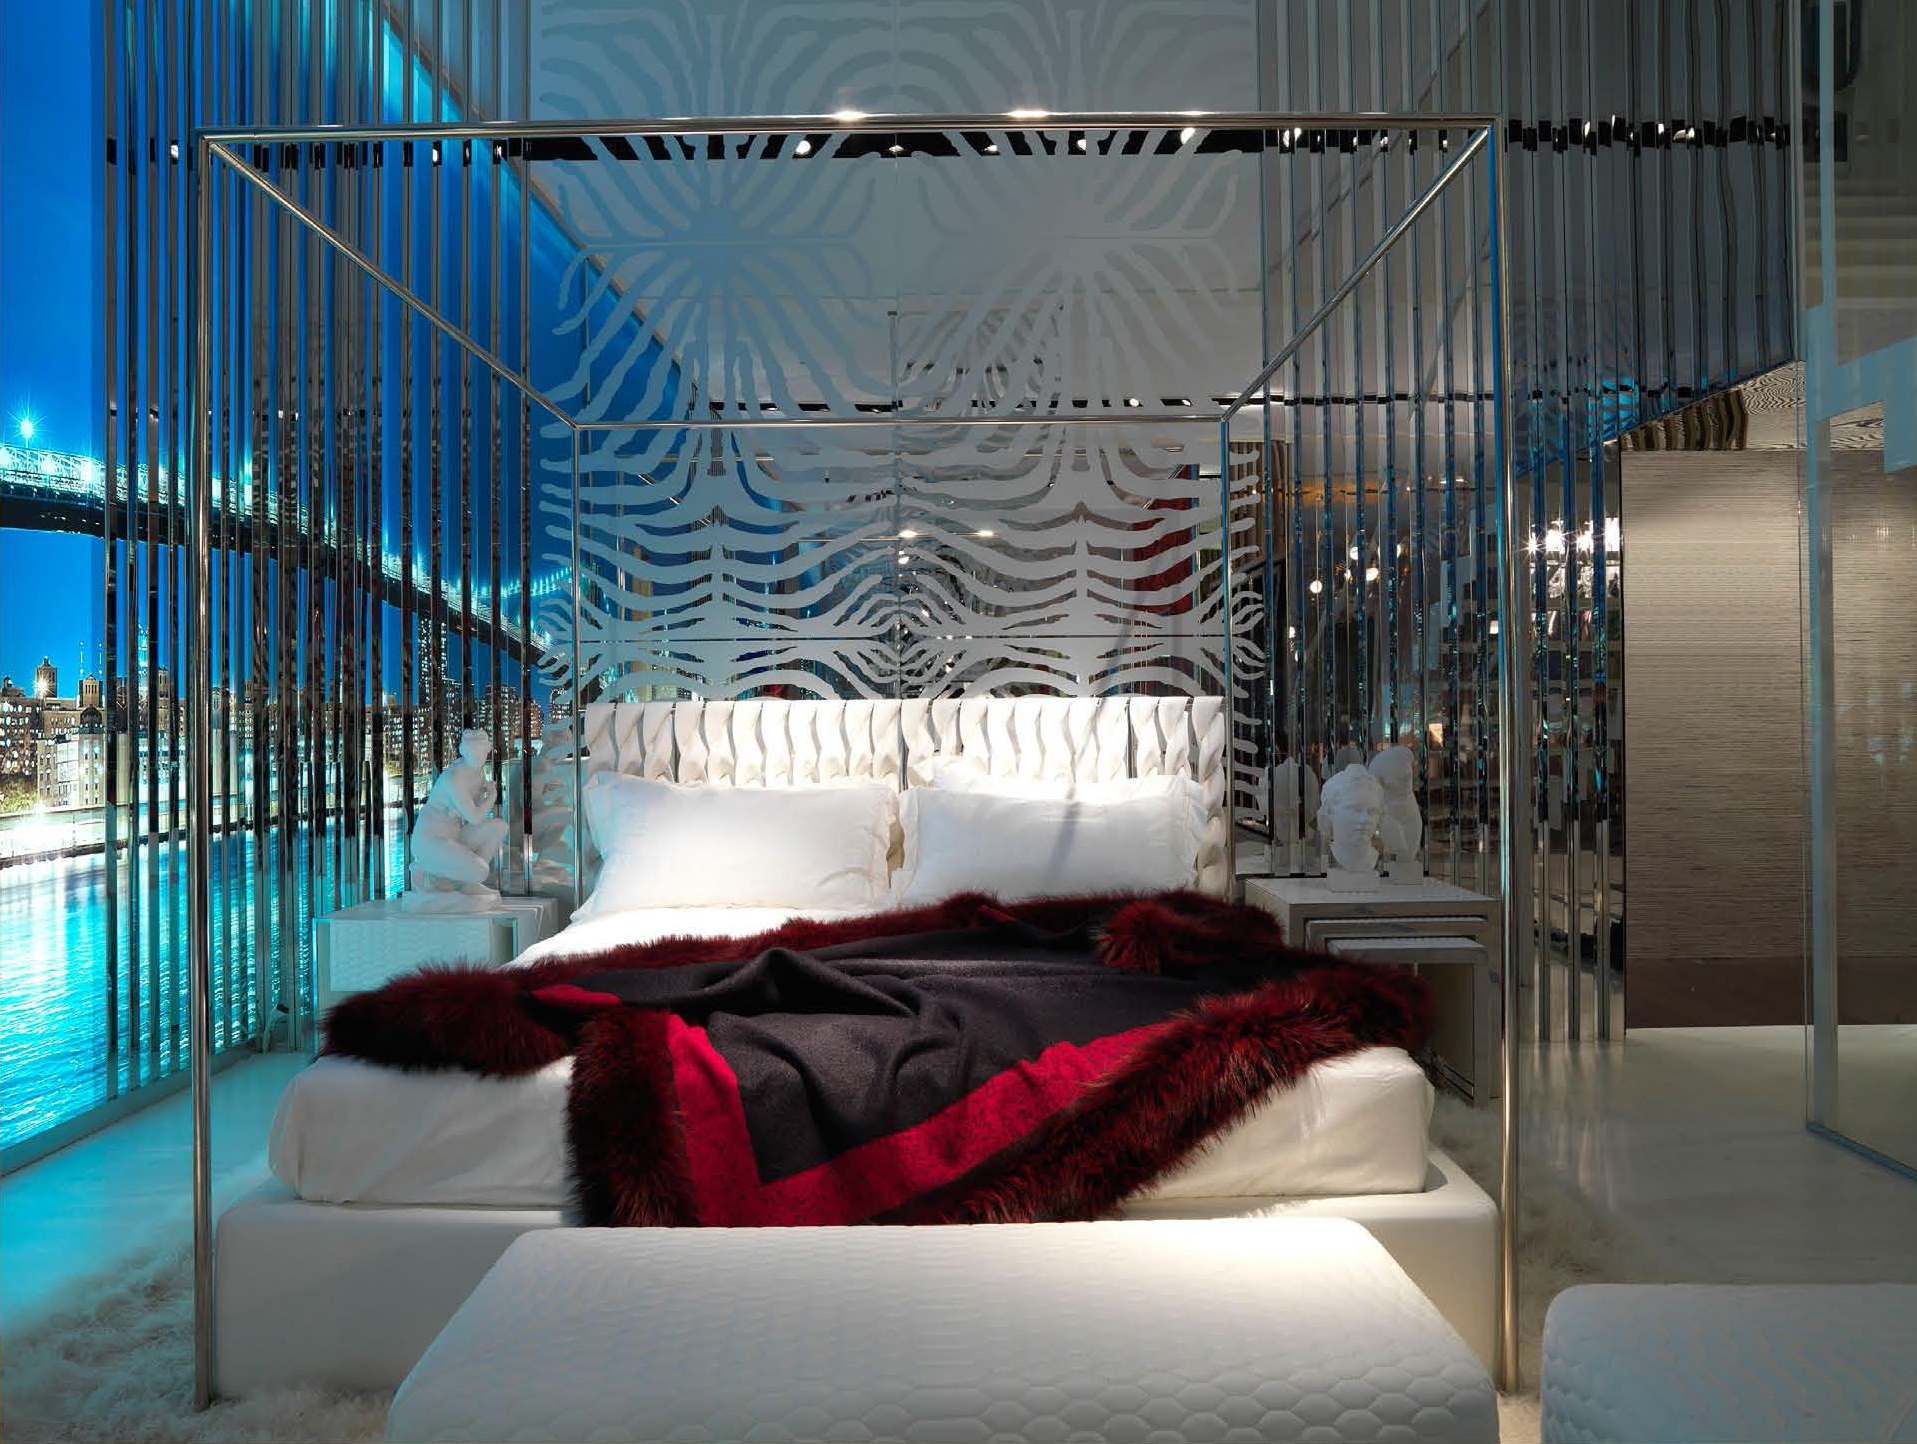 Roberto_Cavalli_Home_Interiors_Milan_Fair_2014_Page_21